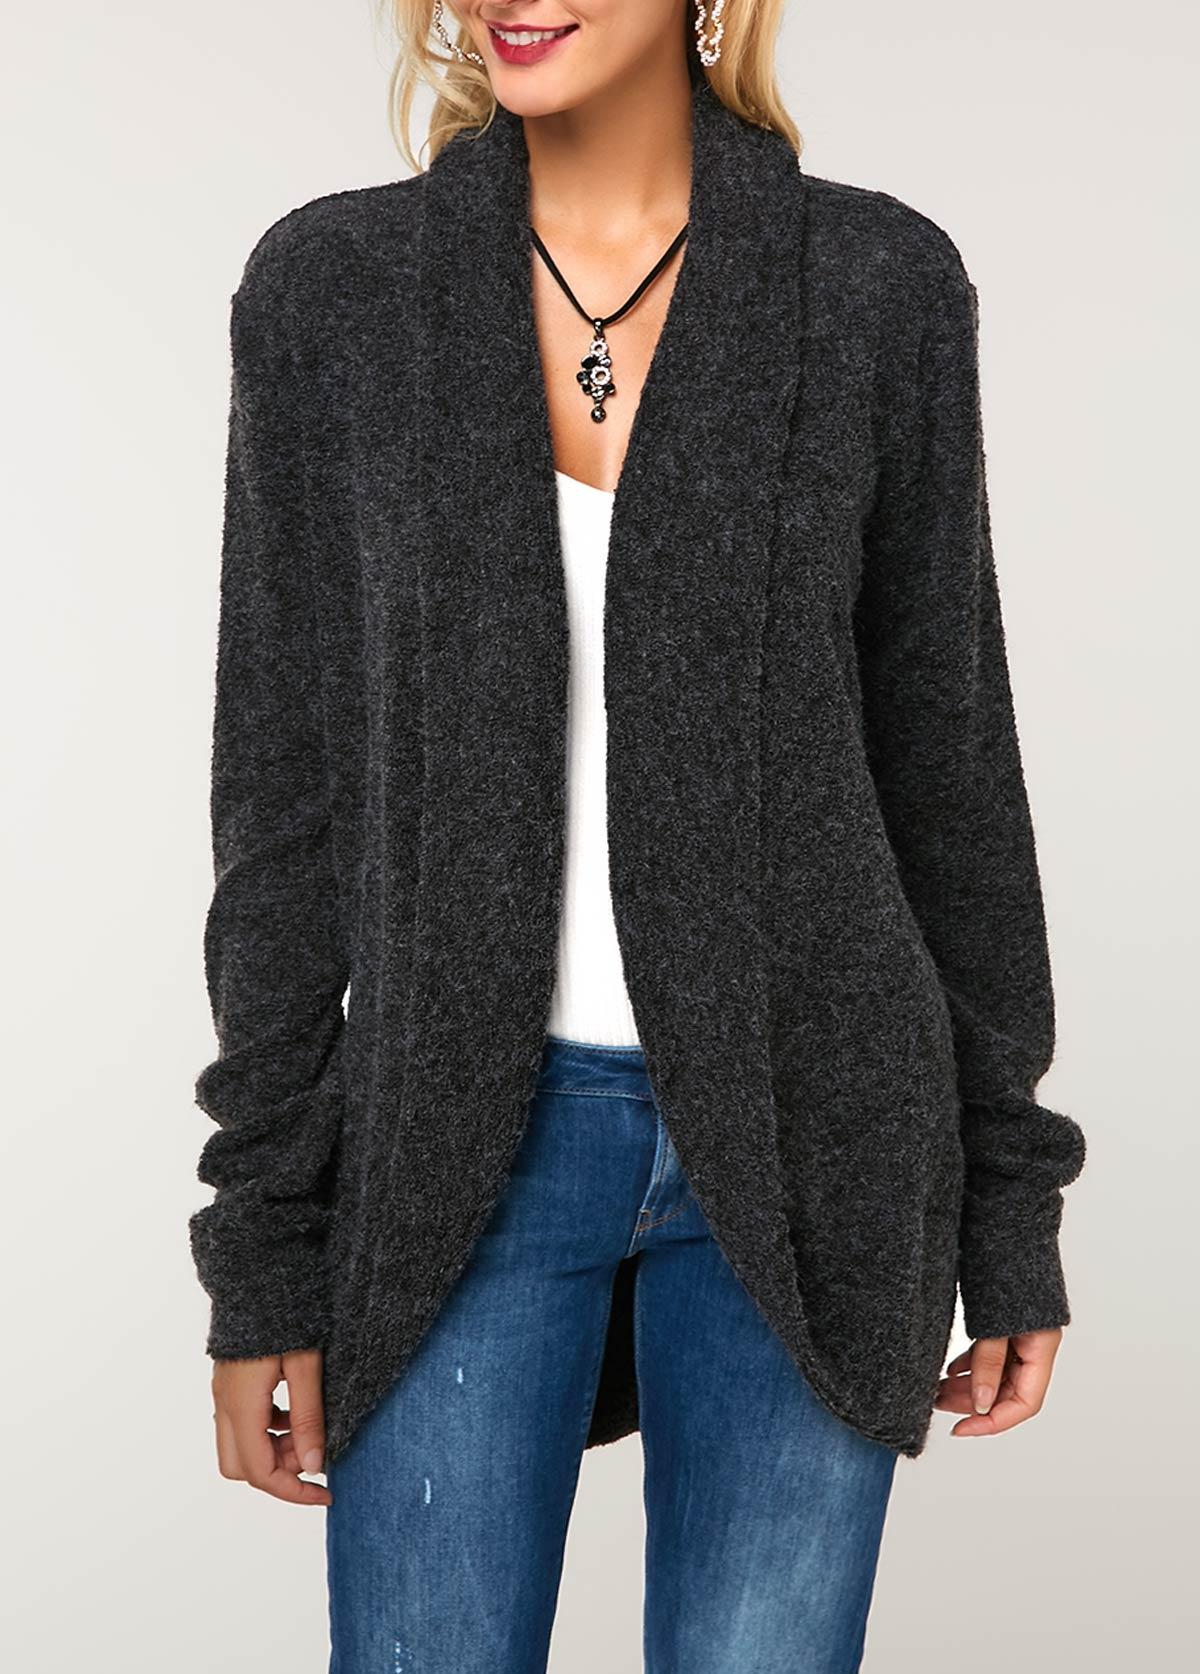 Long Sleeve Dark Grey Curved Hem Knitting Cardigan